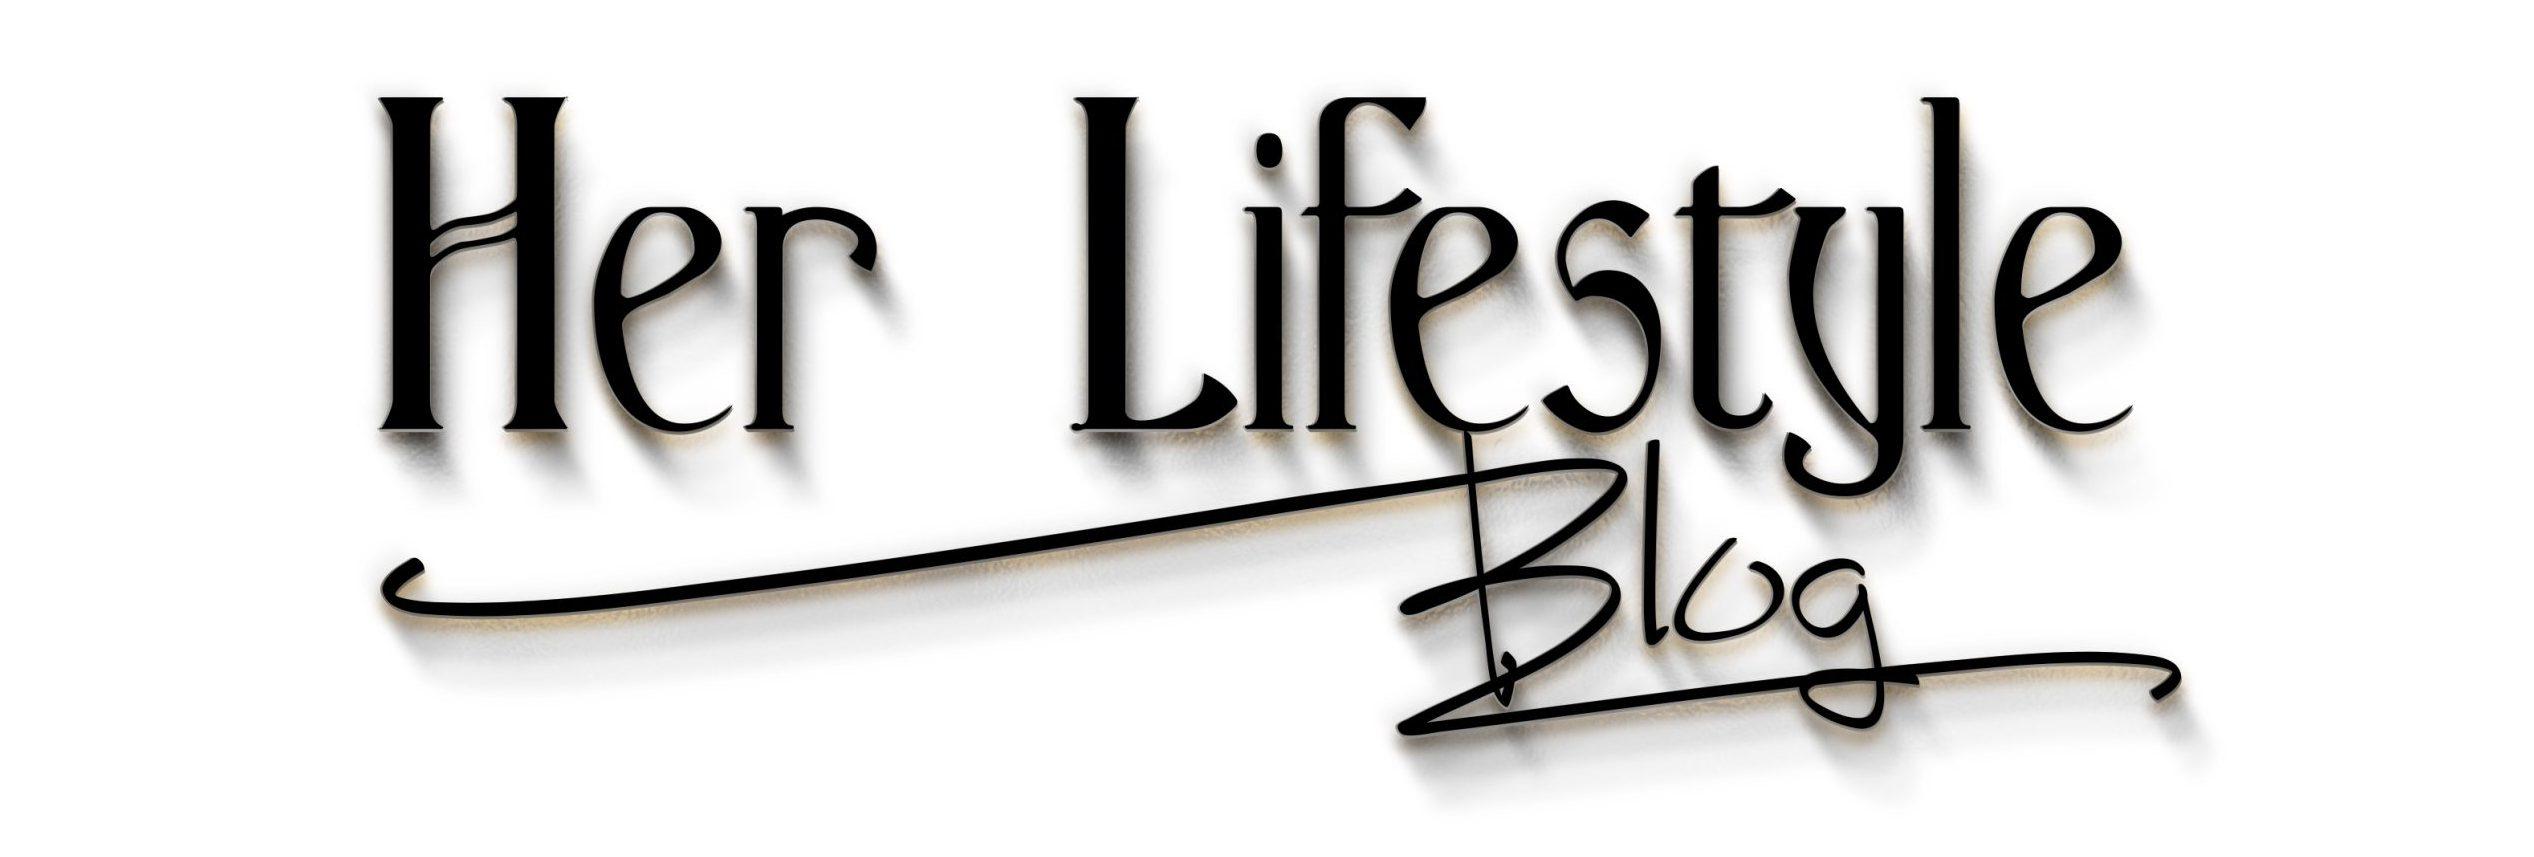 Her Lifestyle Blog